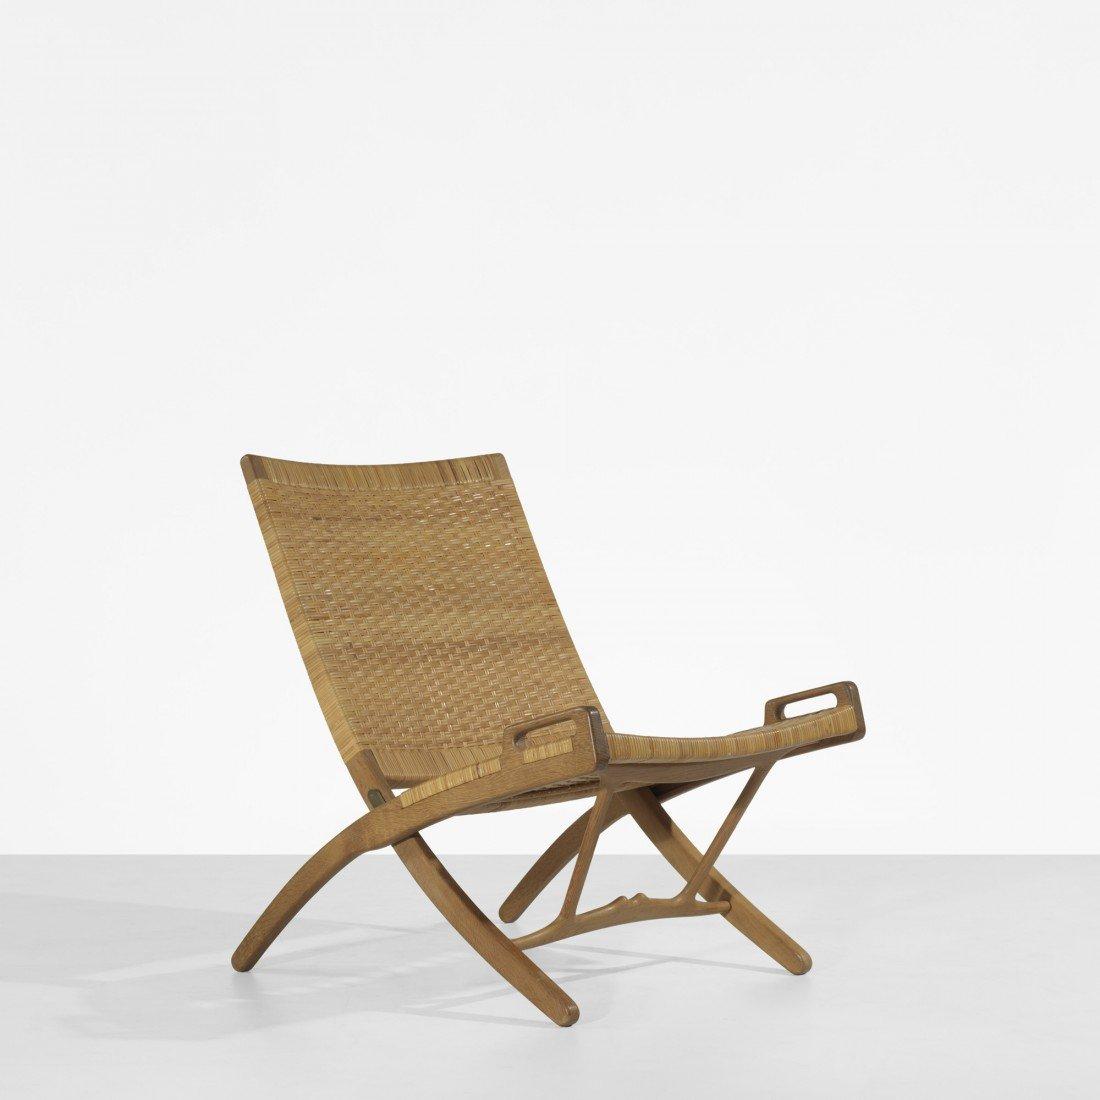 111: Hans Wegner folding chair